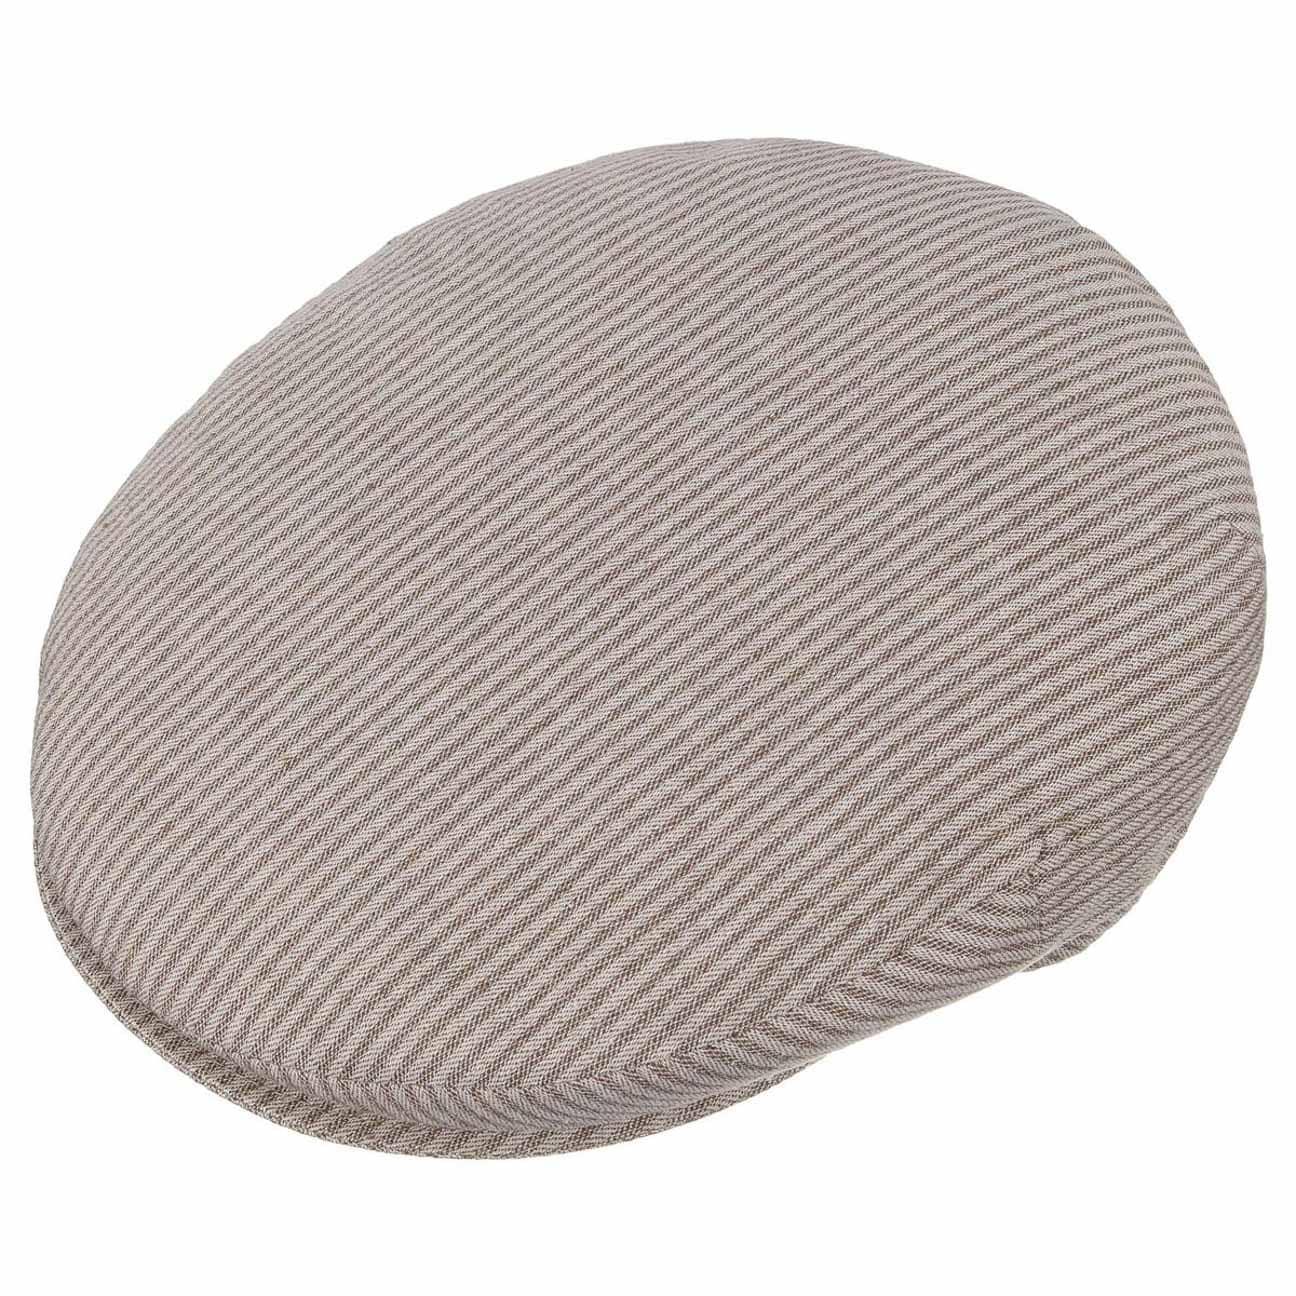 Stripe Cotton Flat Cap by Borsalino - beige 2 ... 929e3680cd51